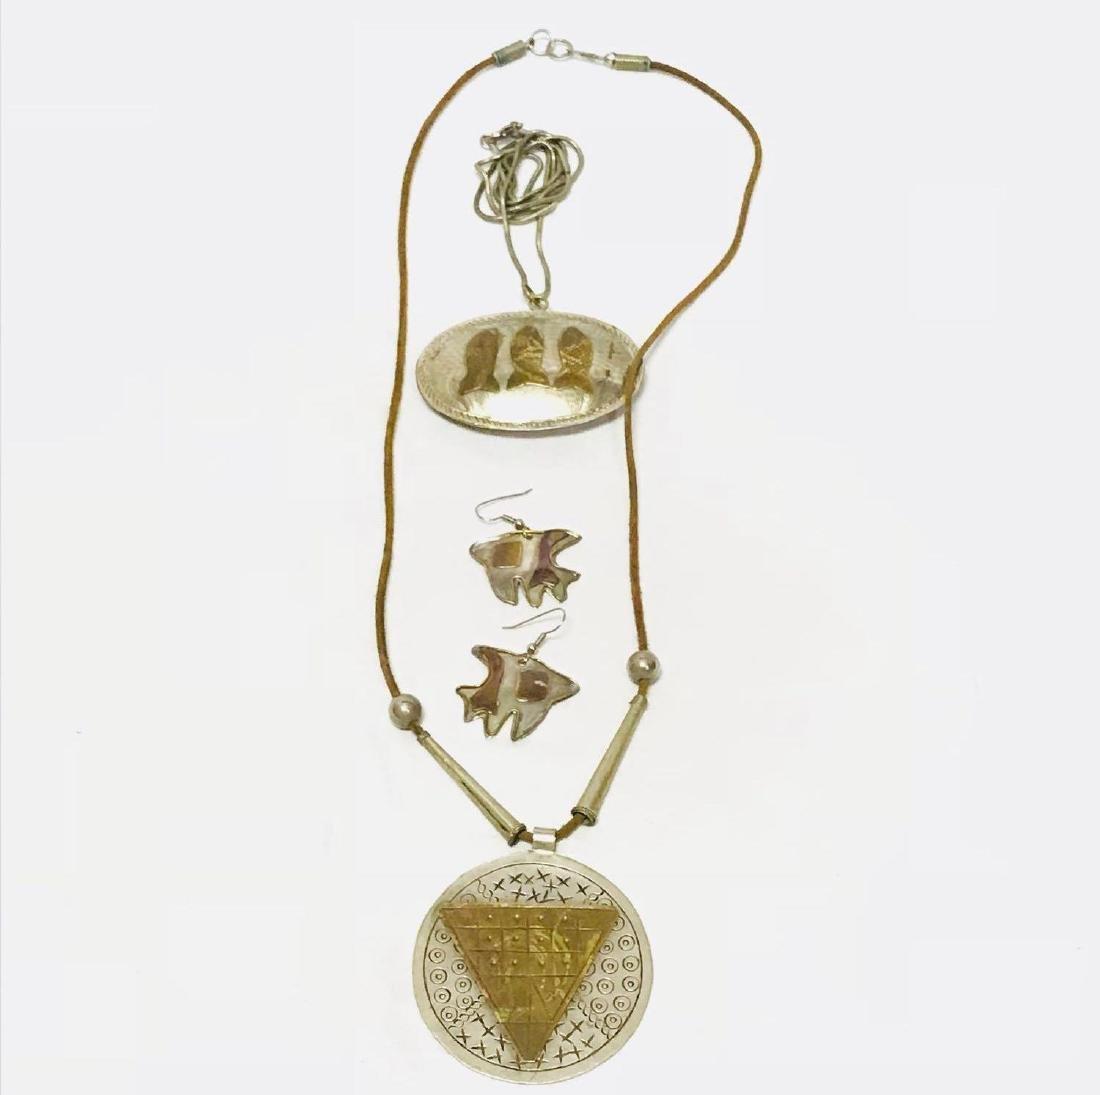 Assortment of Boho Hippy Jewelry